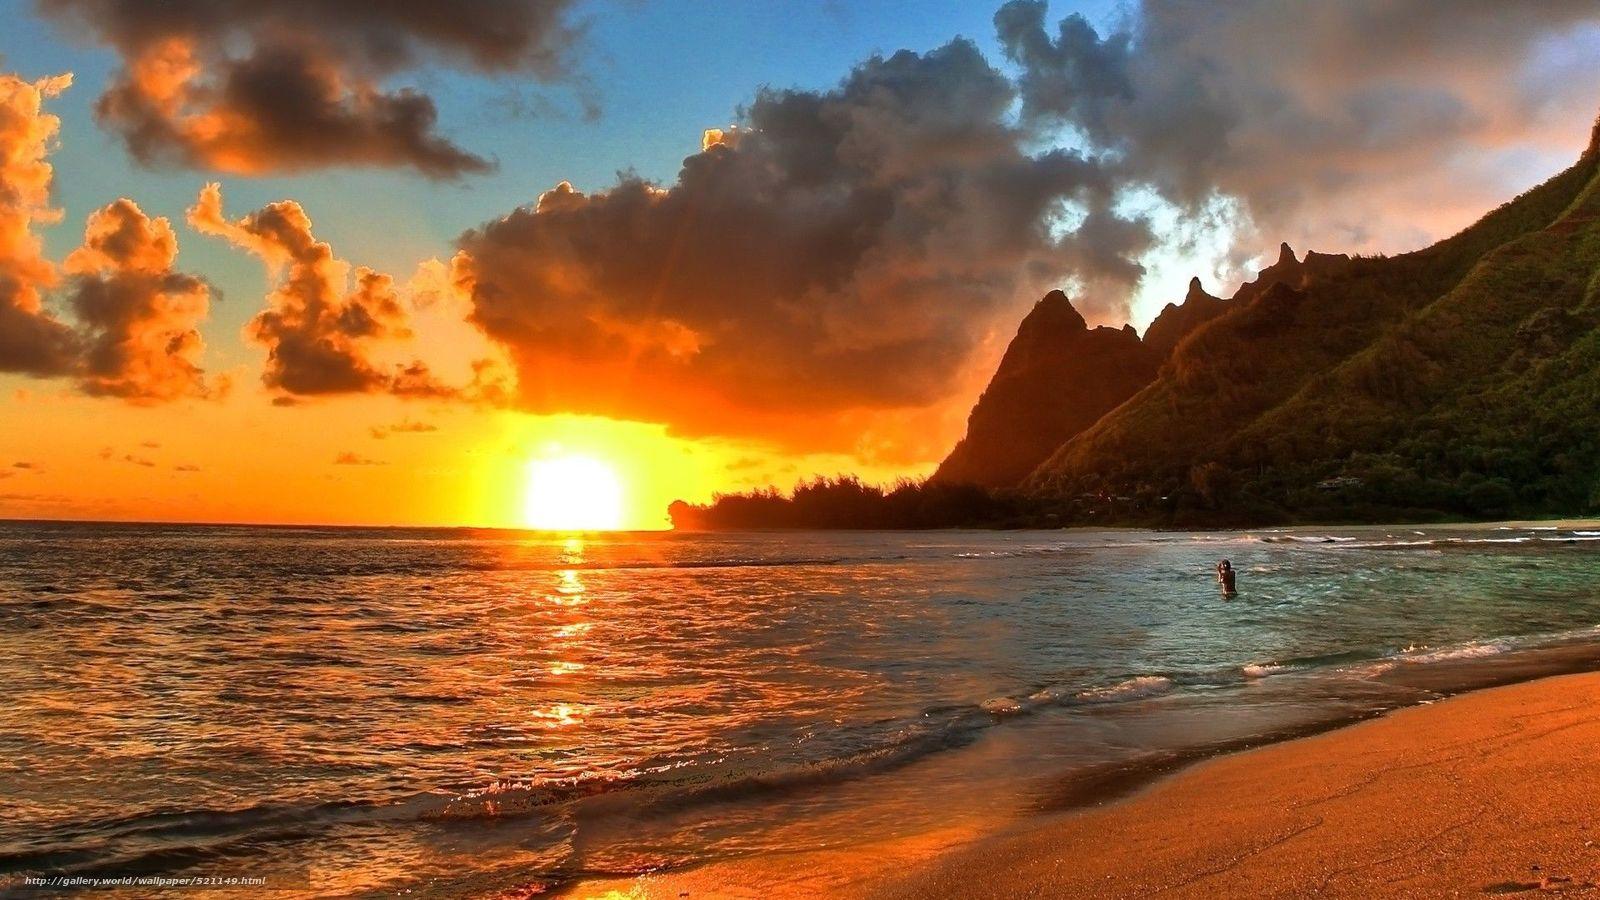 Tlcharger fond d 39 ecran mer plage coucher du soleil fonds for Immagini spettacolari per desktop